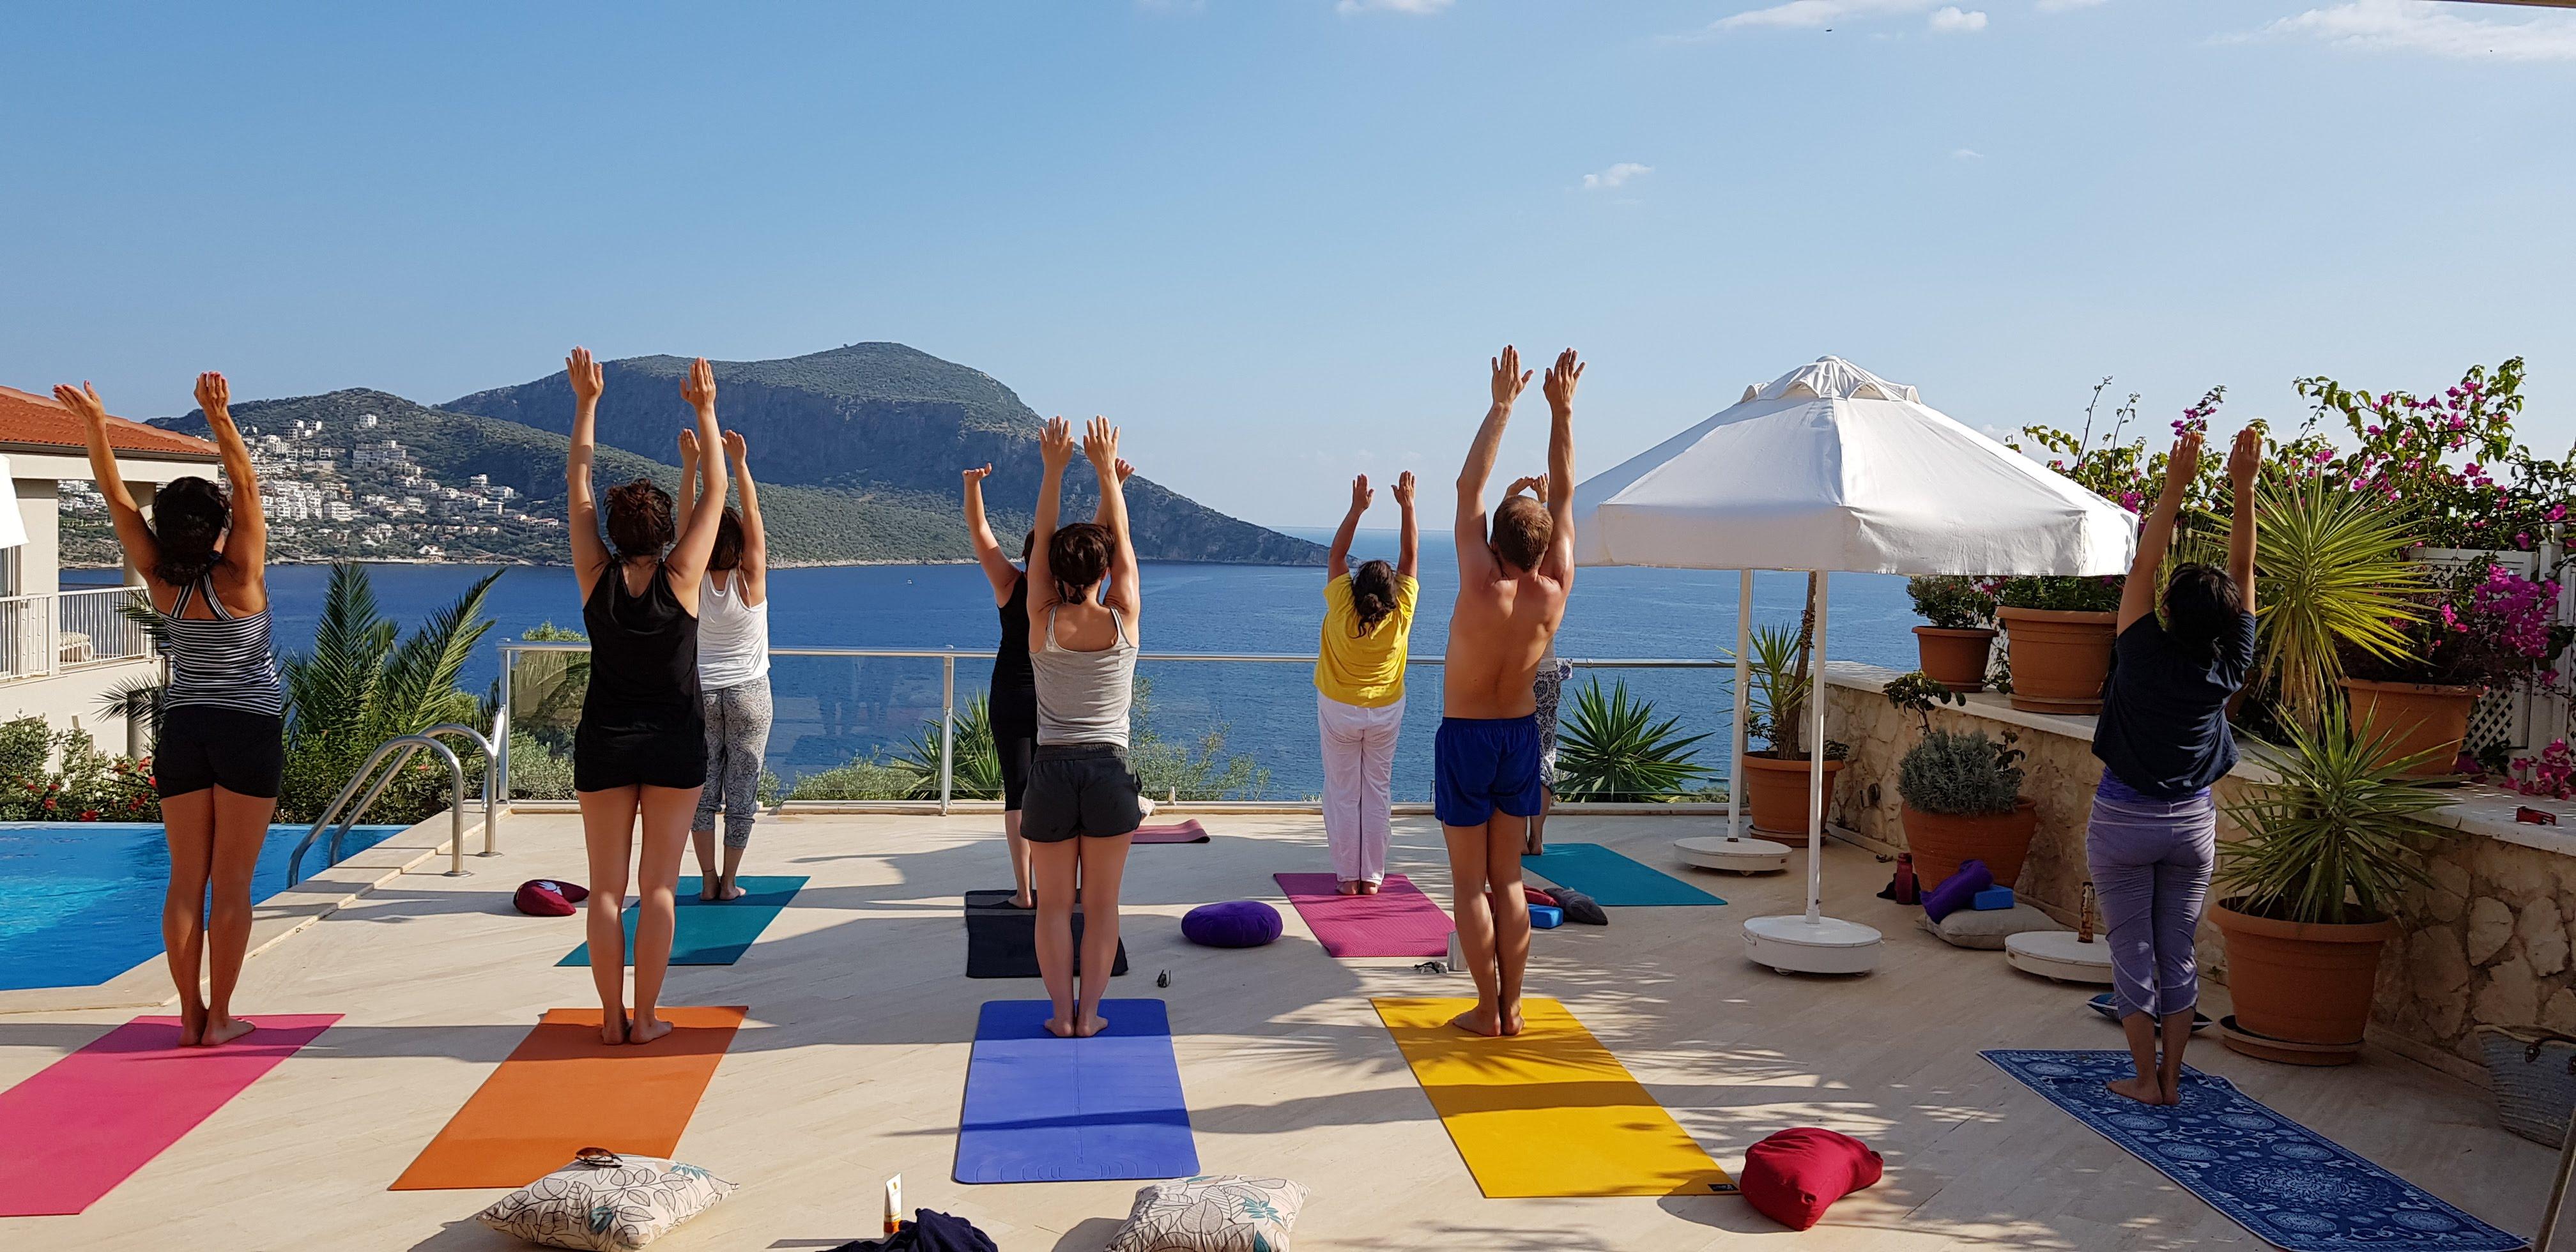 8 Tage- Leben wie ein Yogi @Kalkan am Mittelmeer, Türkei